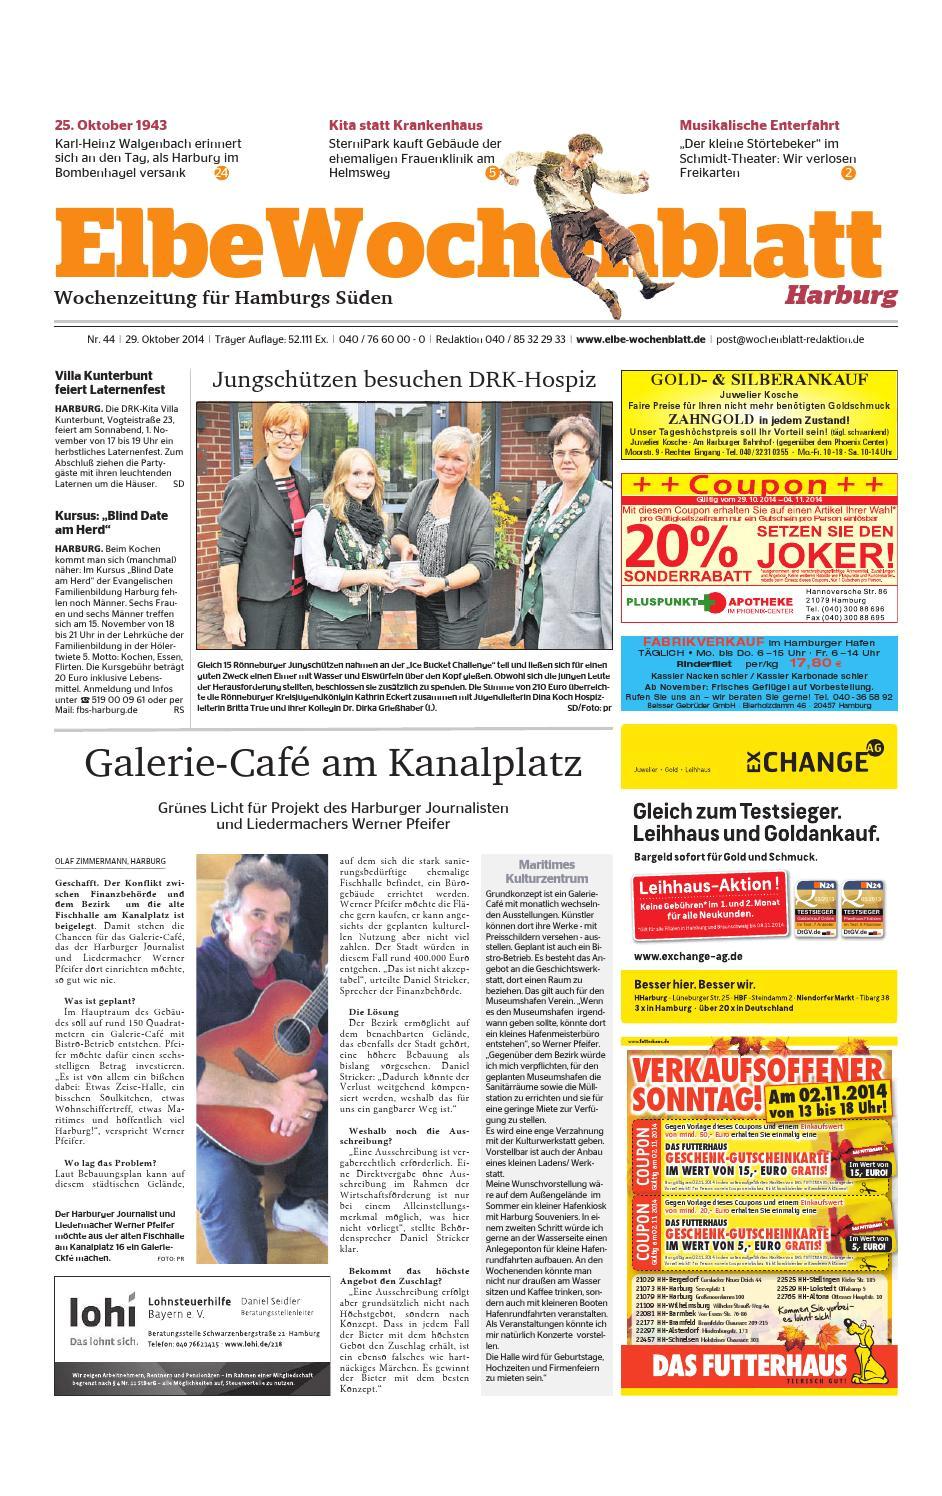 harburg kw44 2014 by elbe wochenblatt verlagsgesellschaft mbh co kg issuu